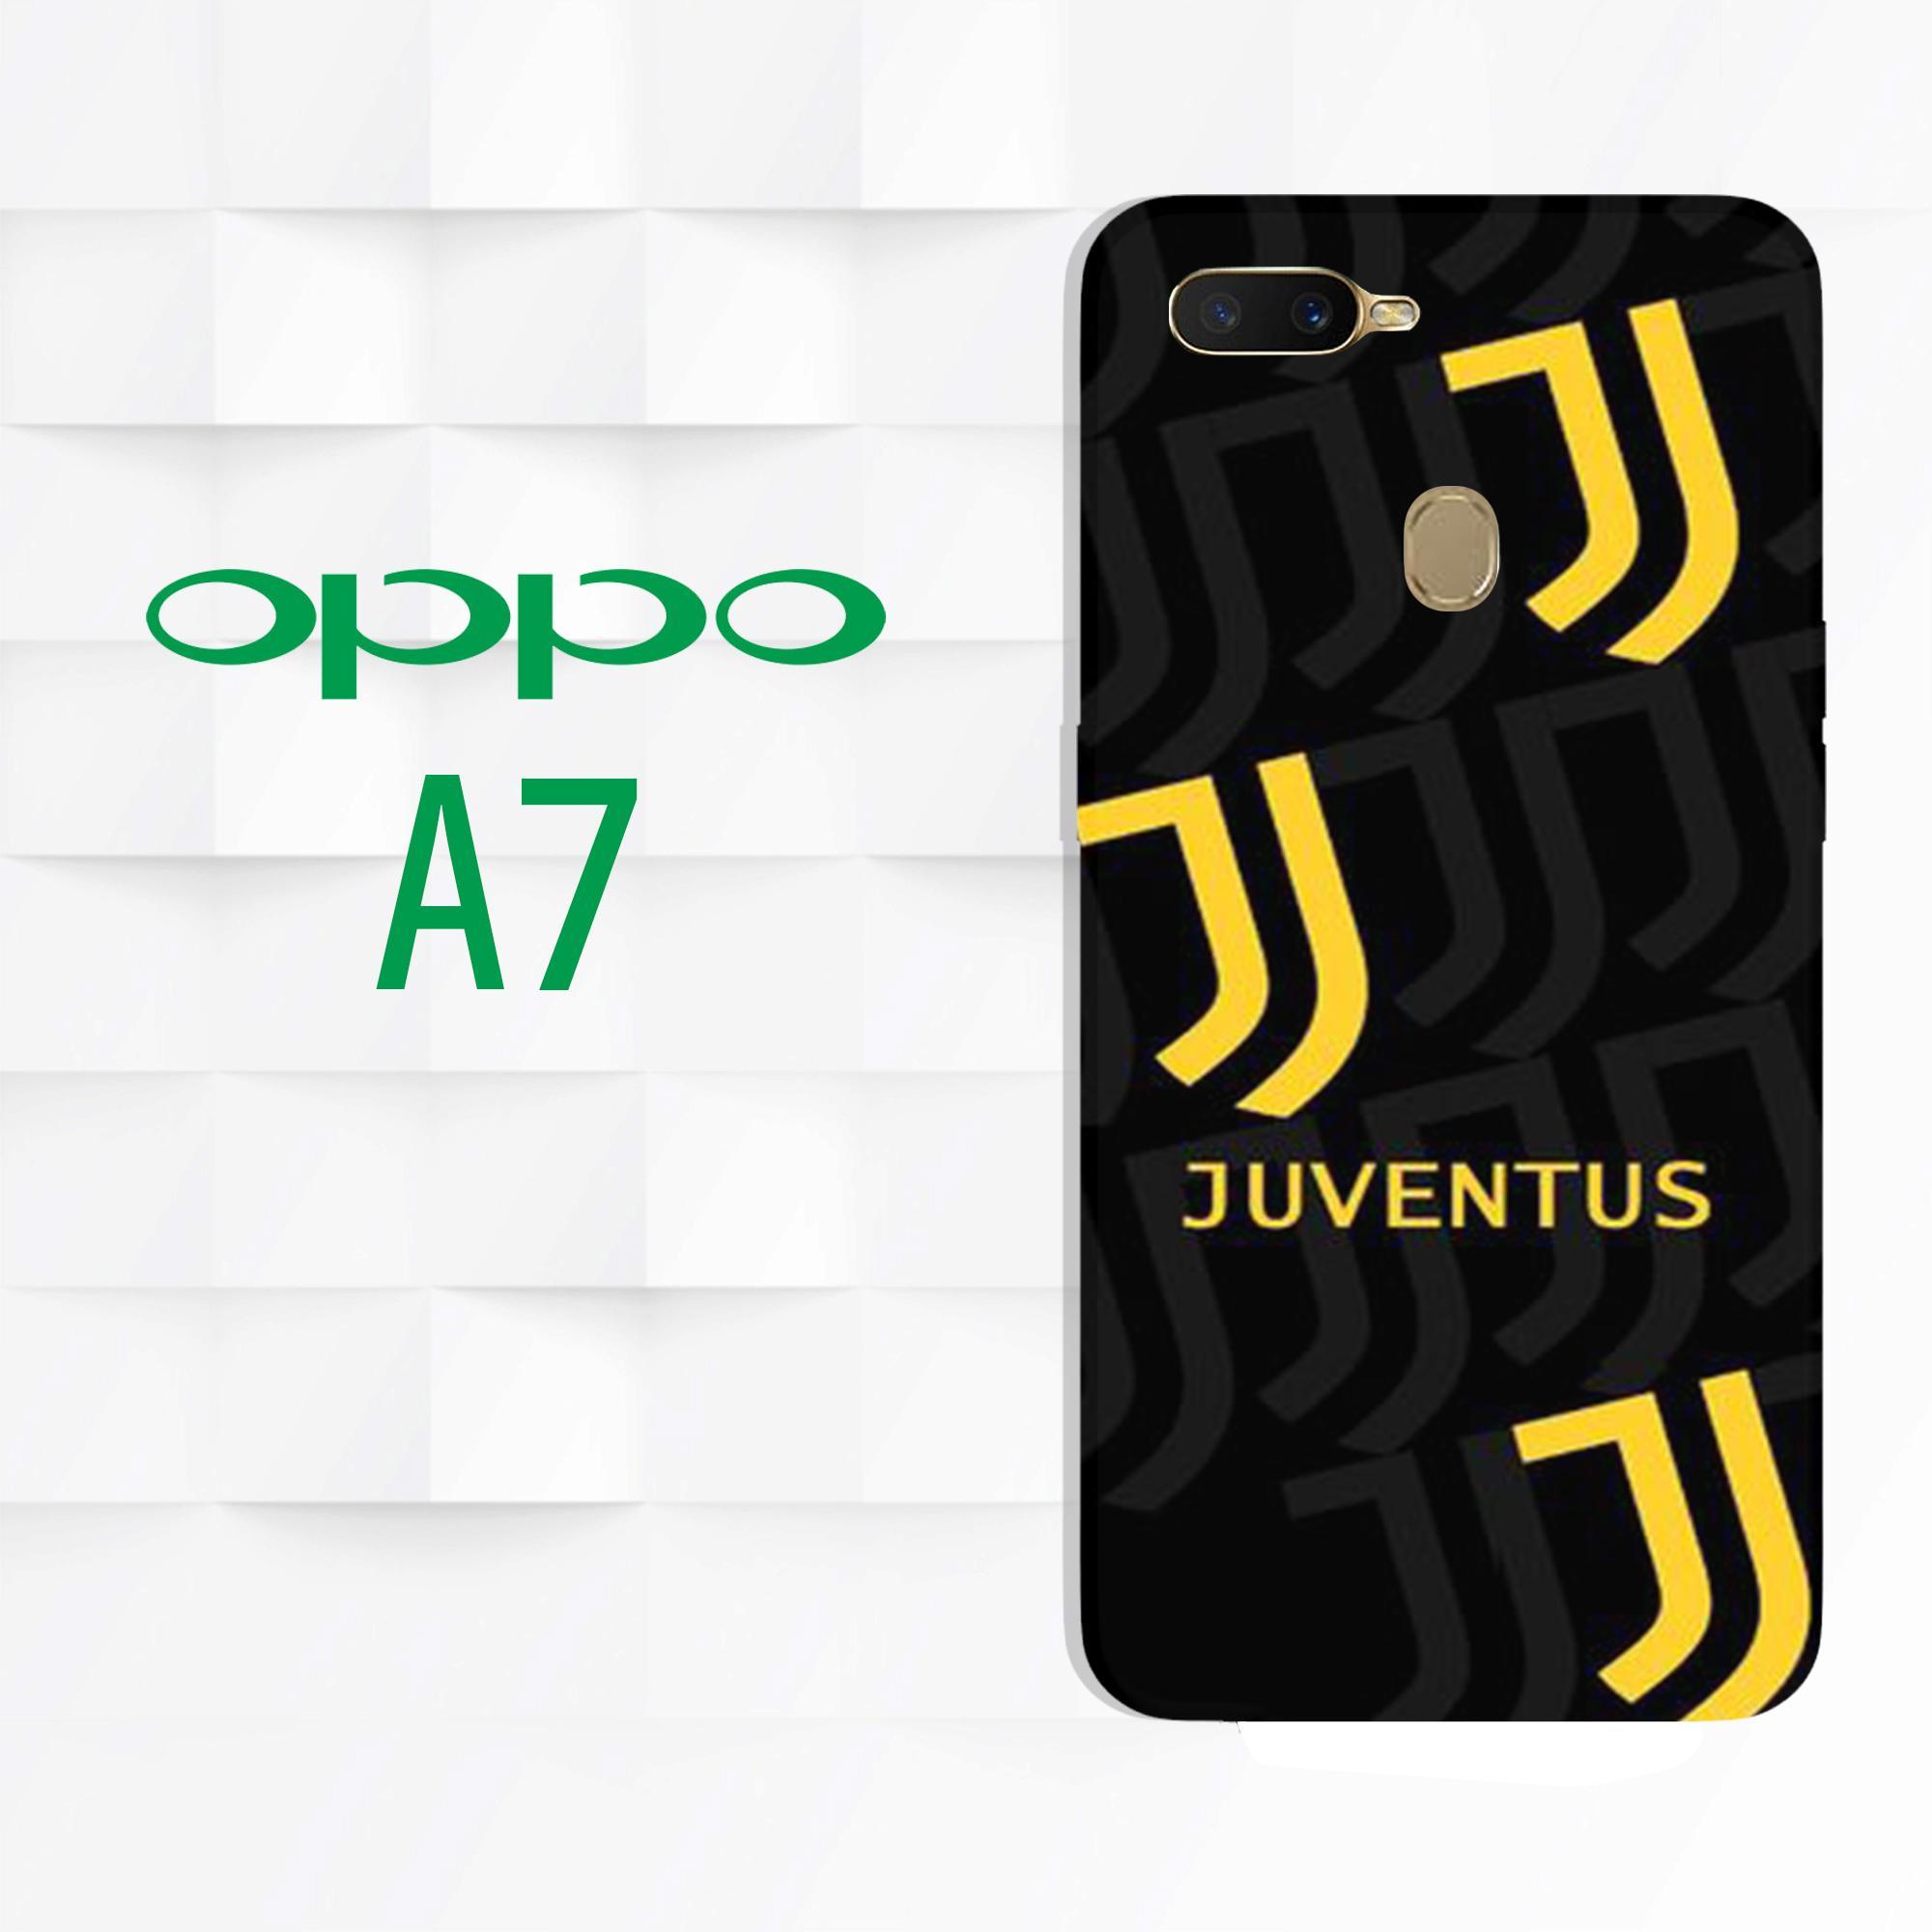 Case Oppo A7 Fashion Case Soocer q1-8